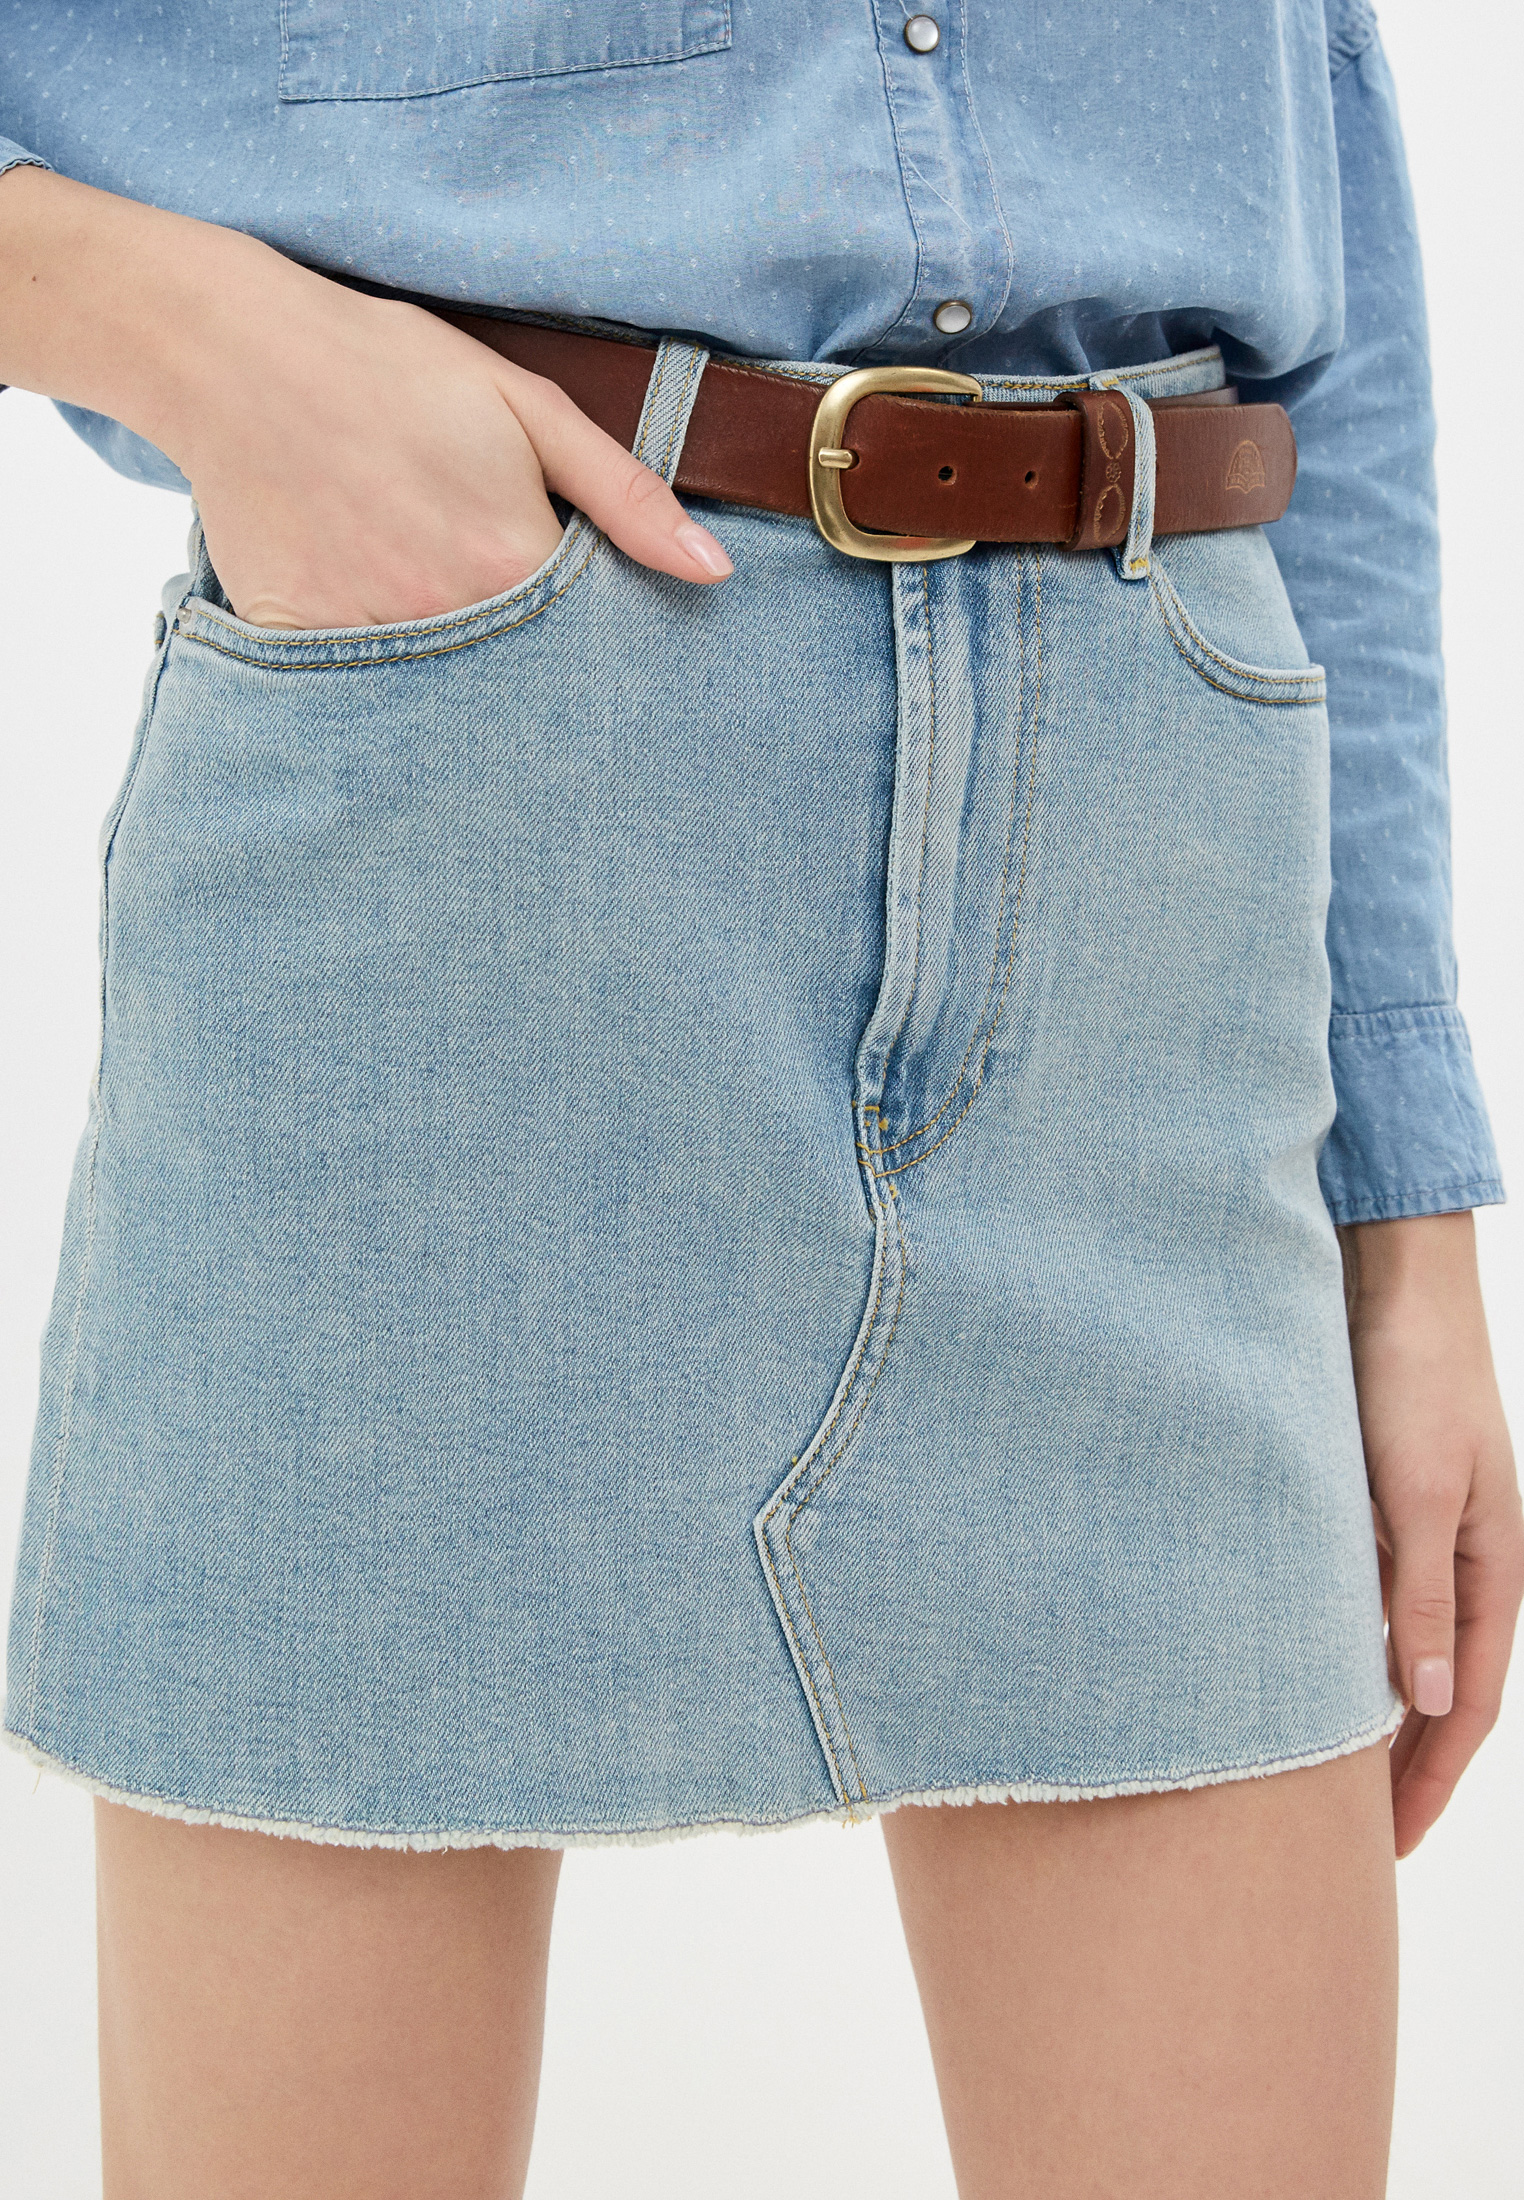 Tommy HILFIGER DENIM Ryan Uomo Jeans kimb Blu Pantaloni Nuovo